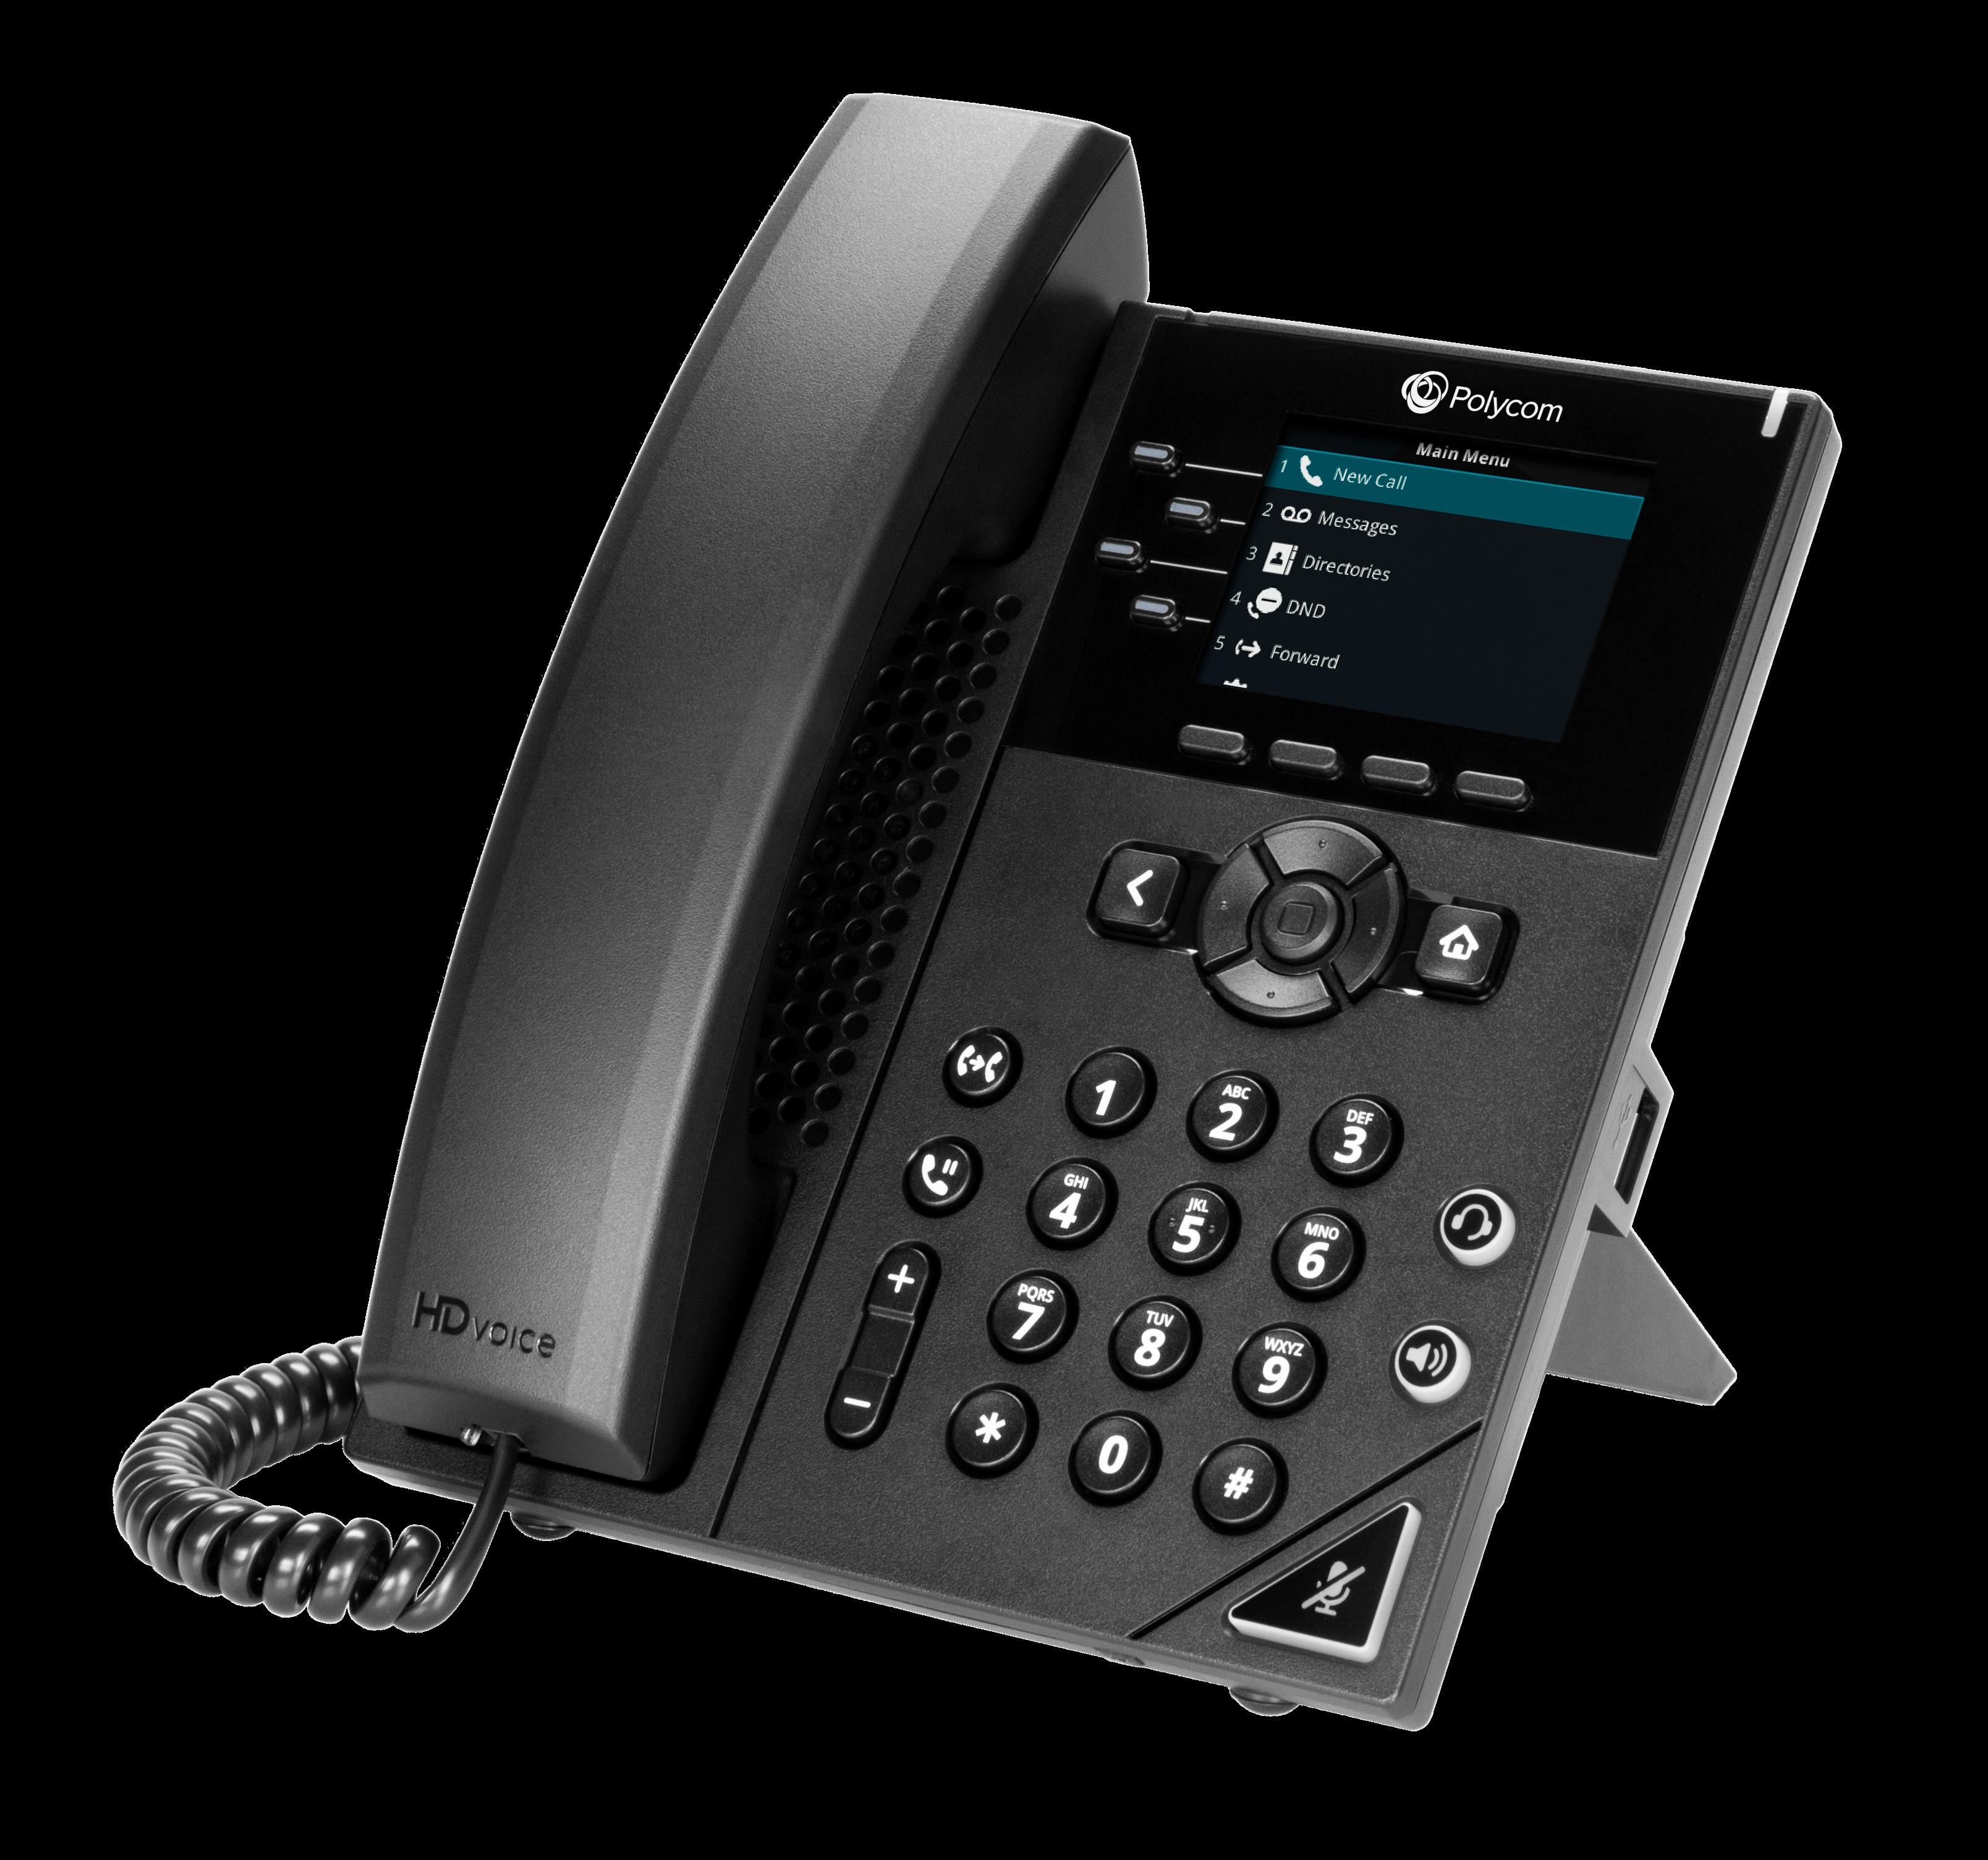 VOIP Services - Polycom VVX 250